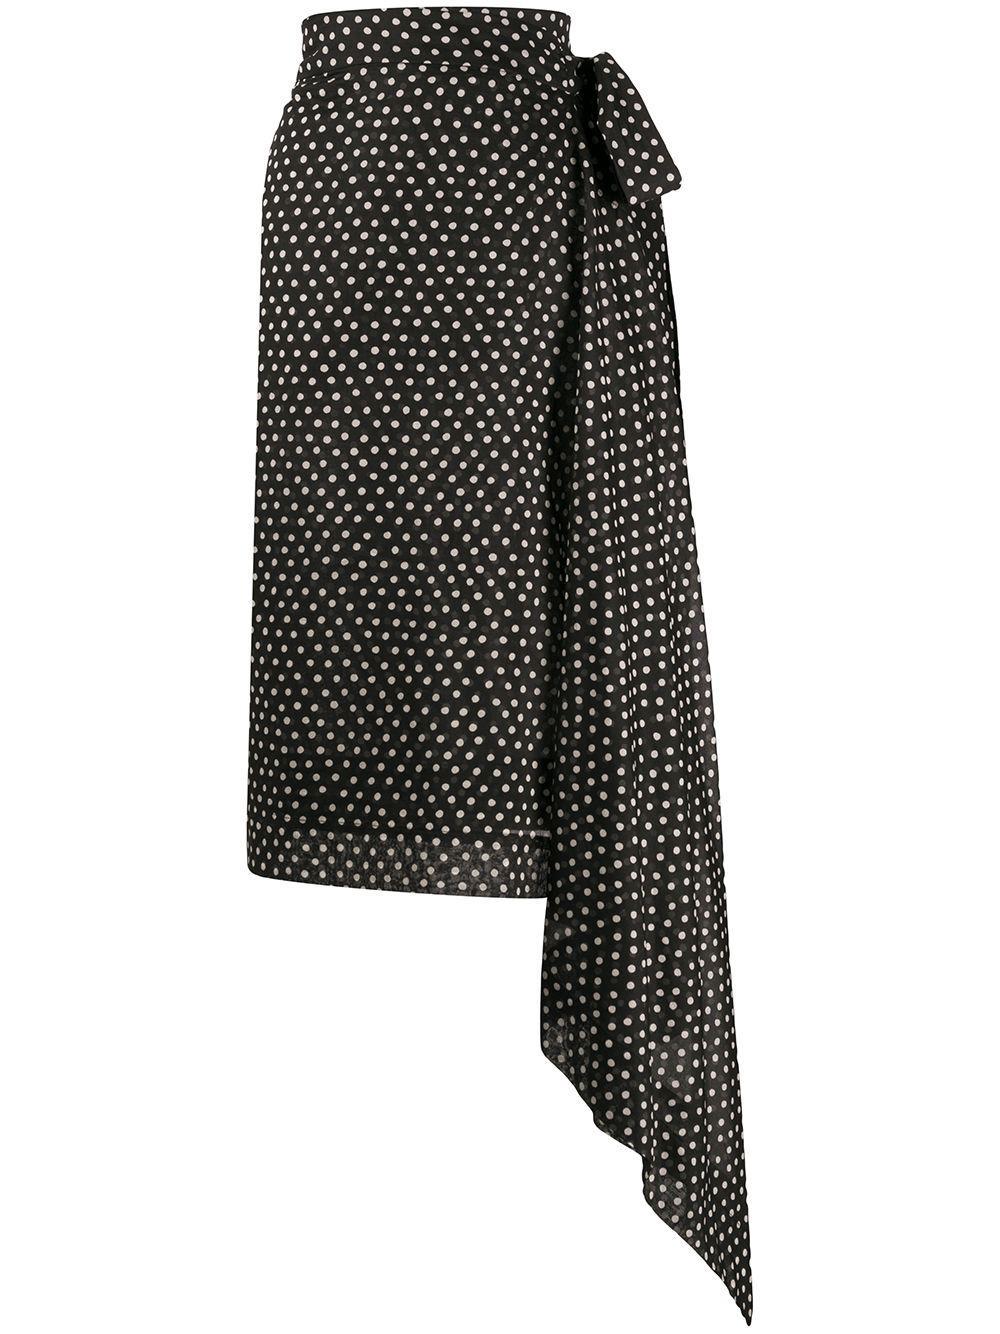 Vivienne Westwood Anglomania  юбка с запахом в горох